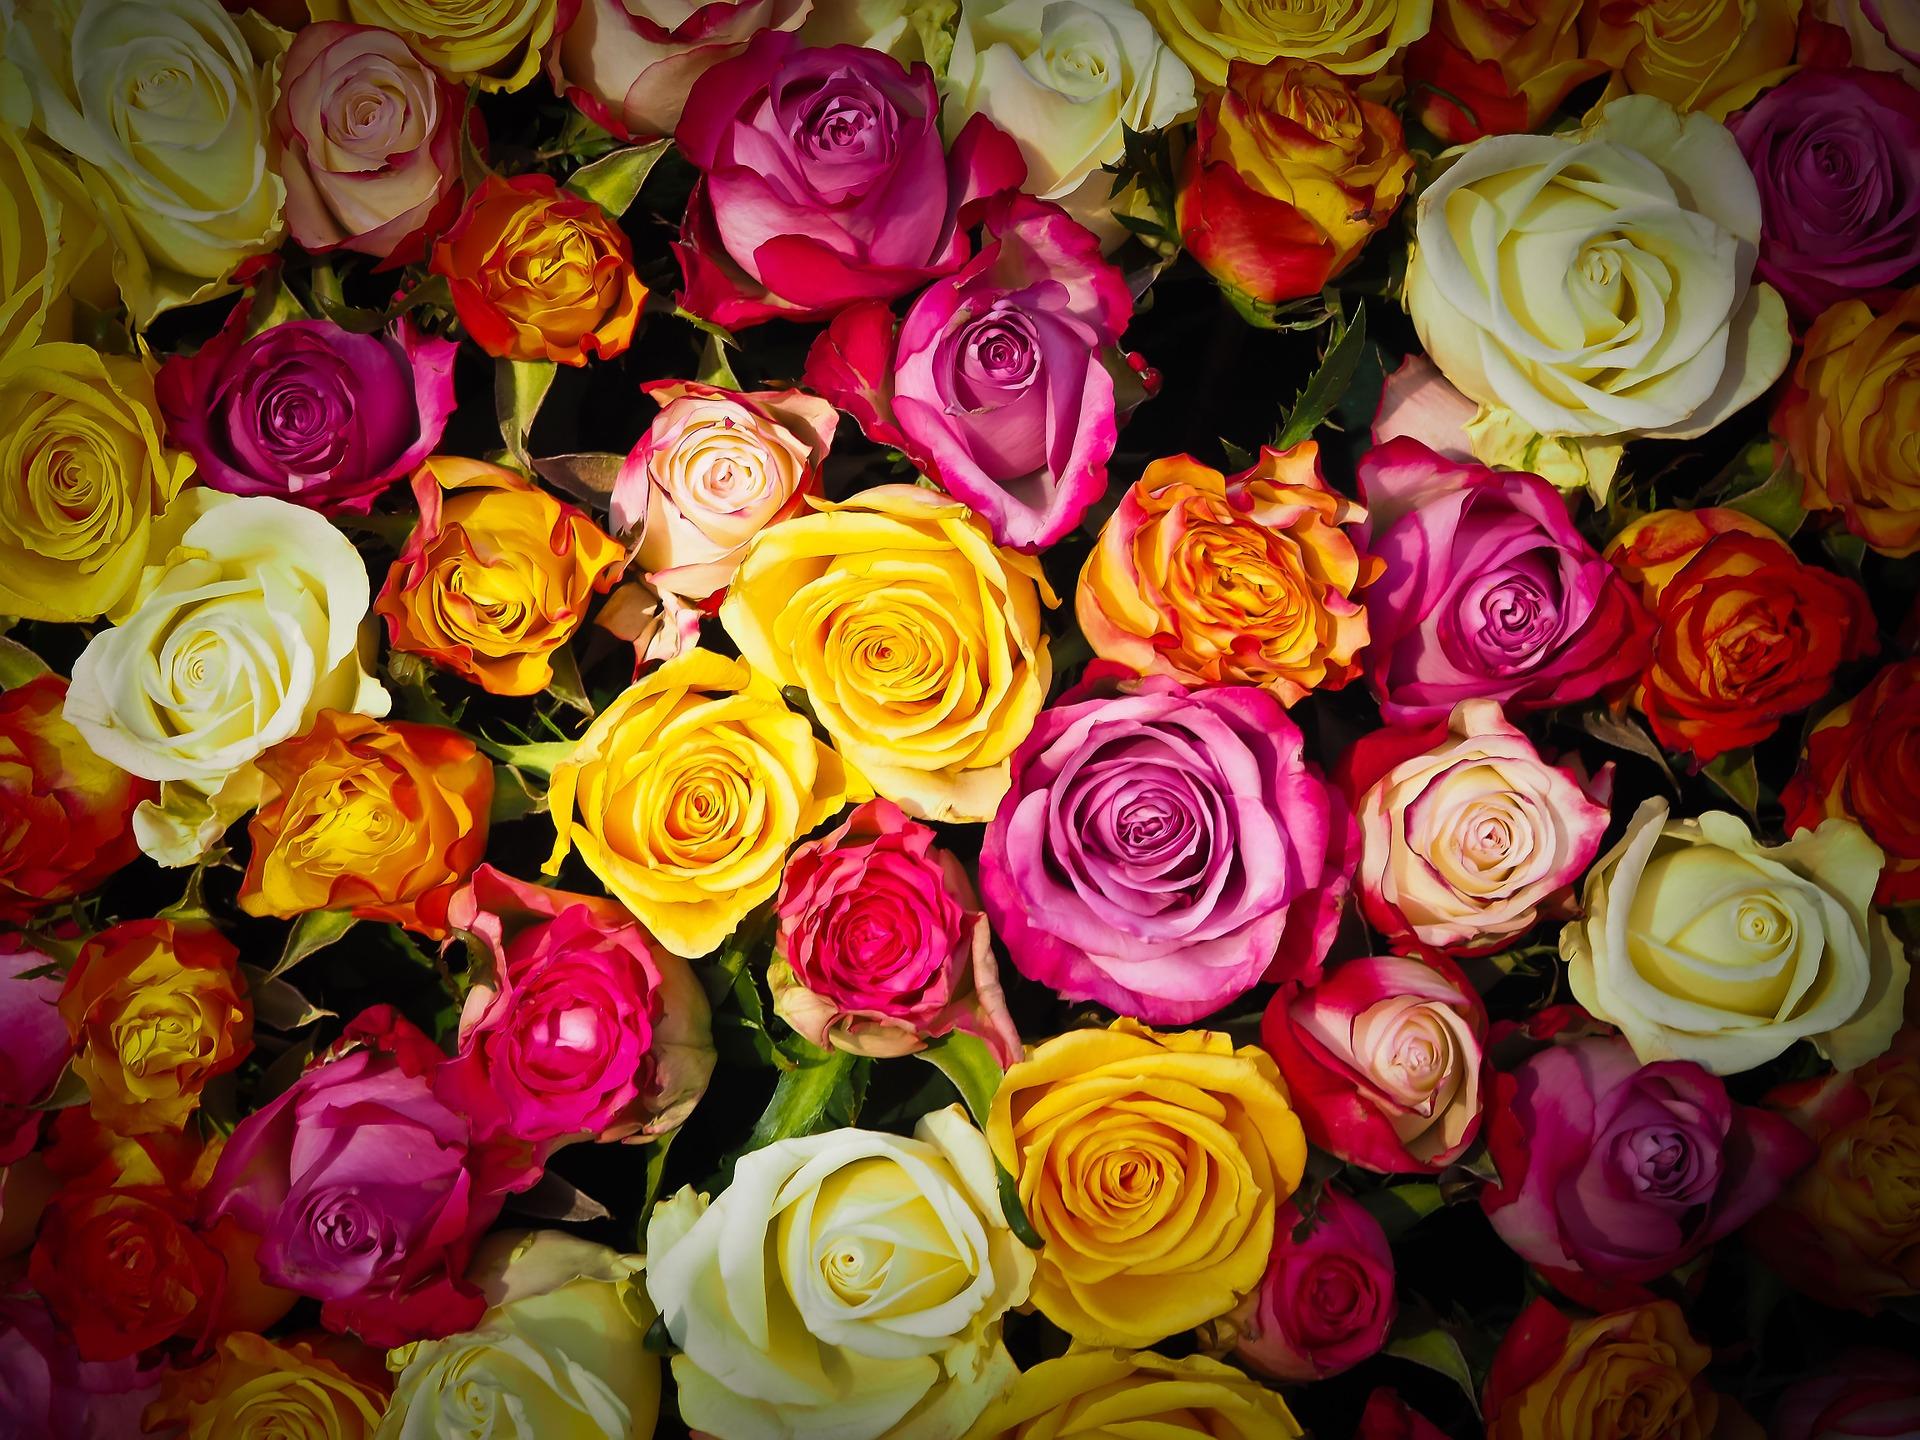 Bunte Rosen zur Jubiläumsfeier